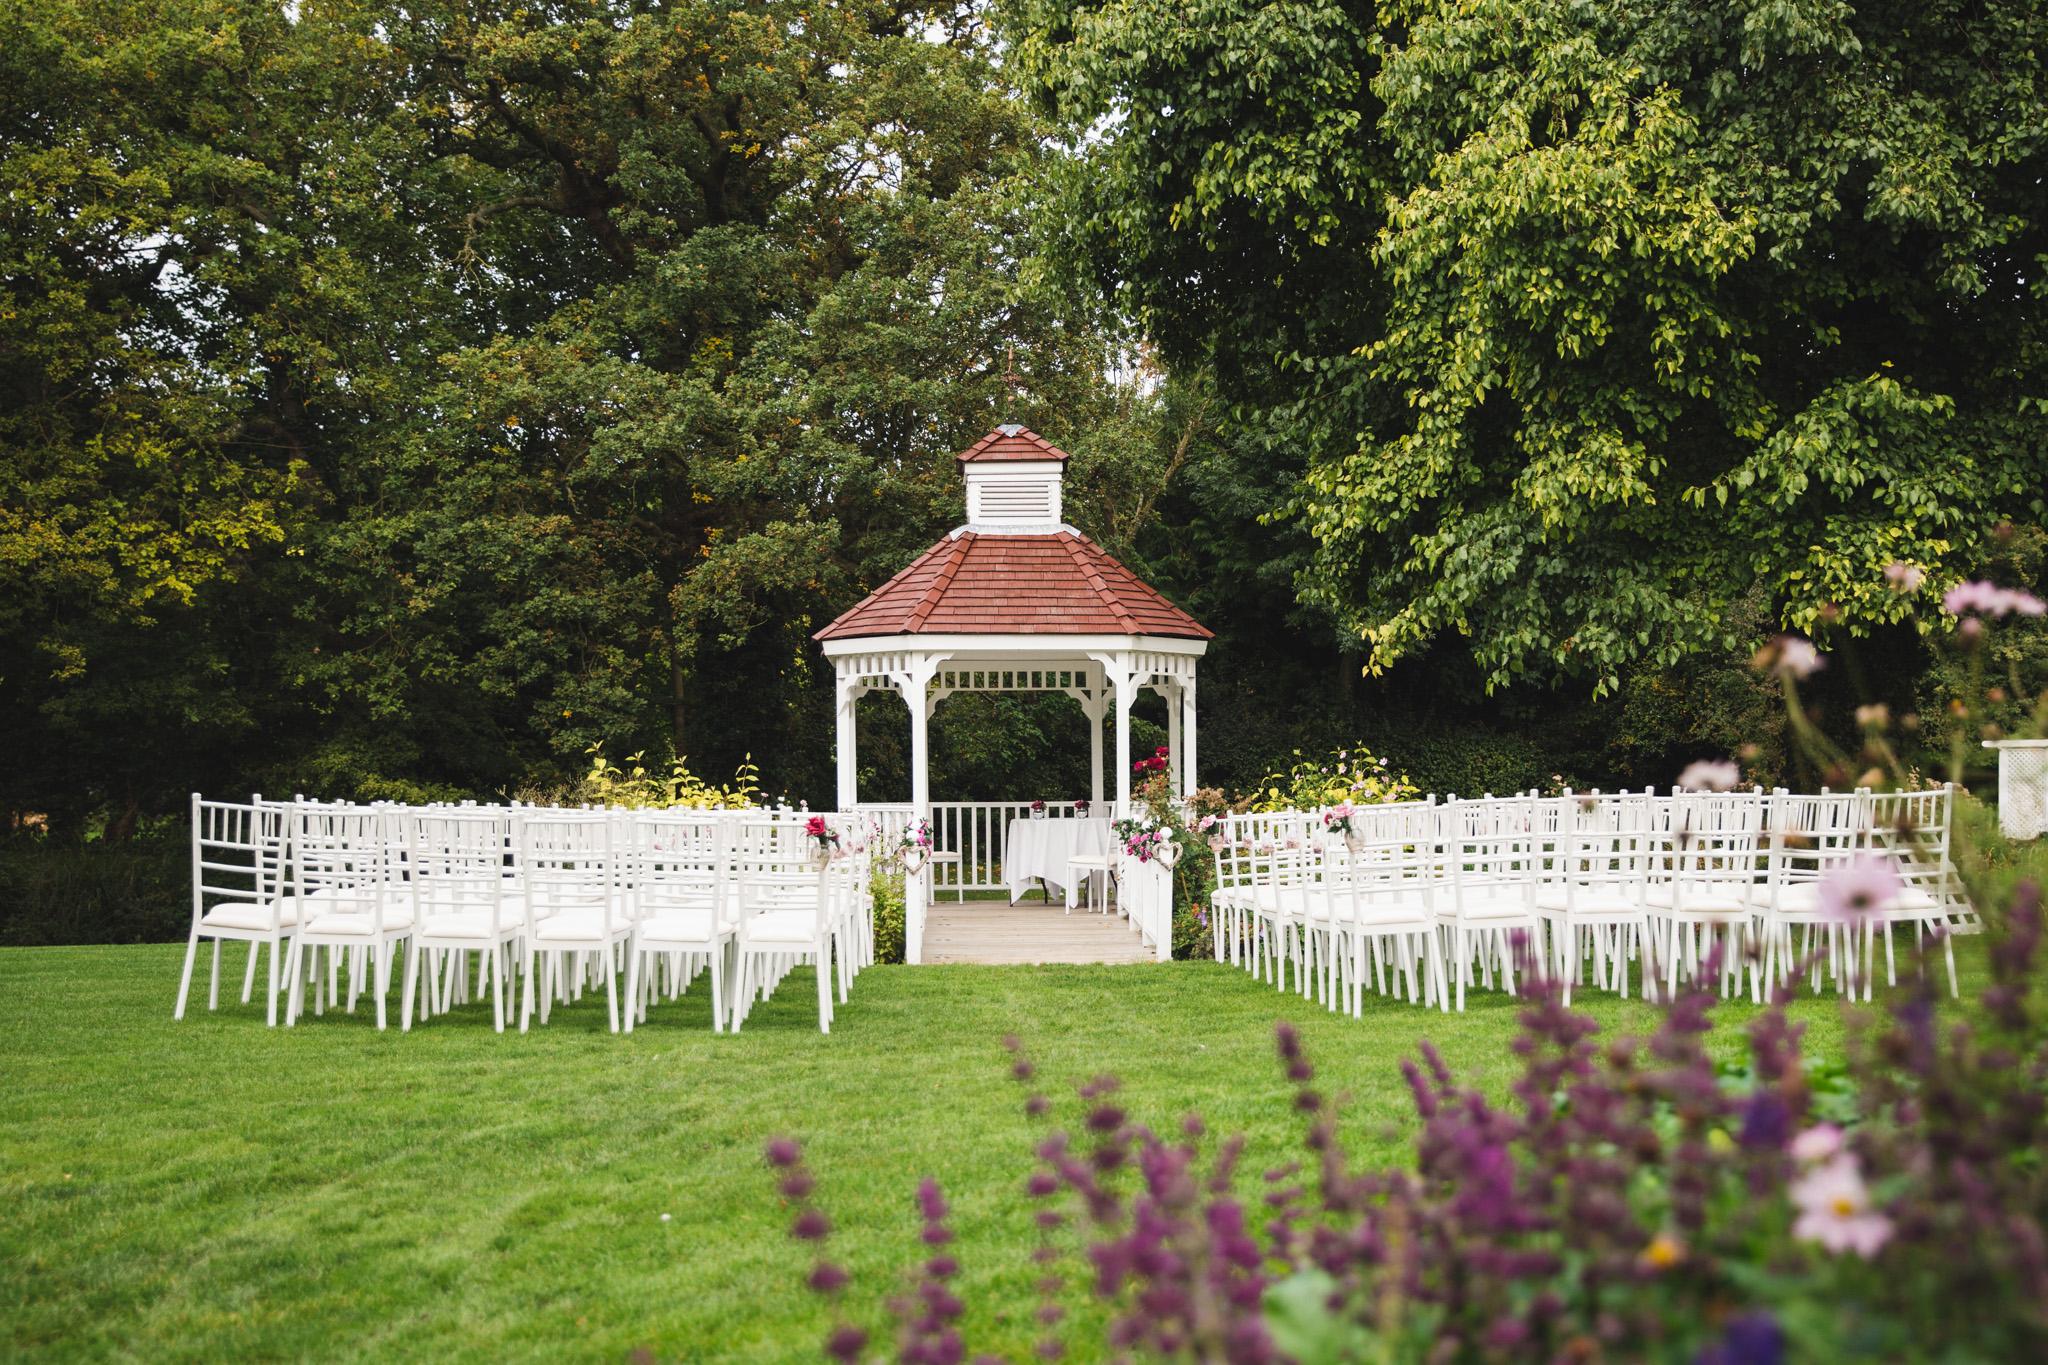 cat-lane-weddings__sheene-mill-wedding-photography__clw__1054_4G2A2290.jpg